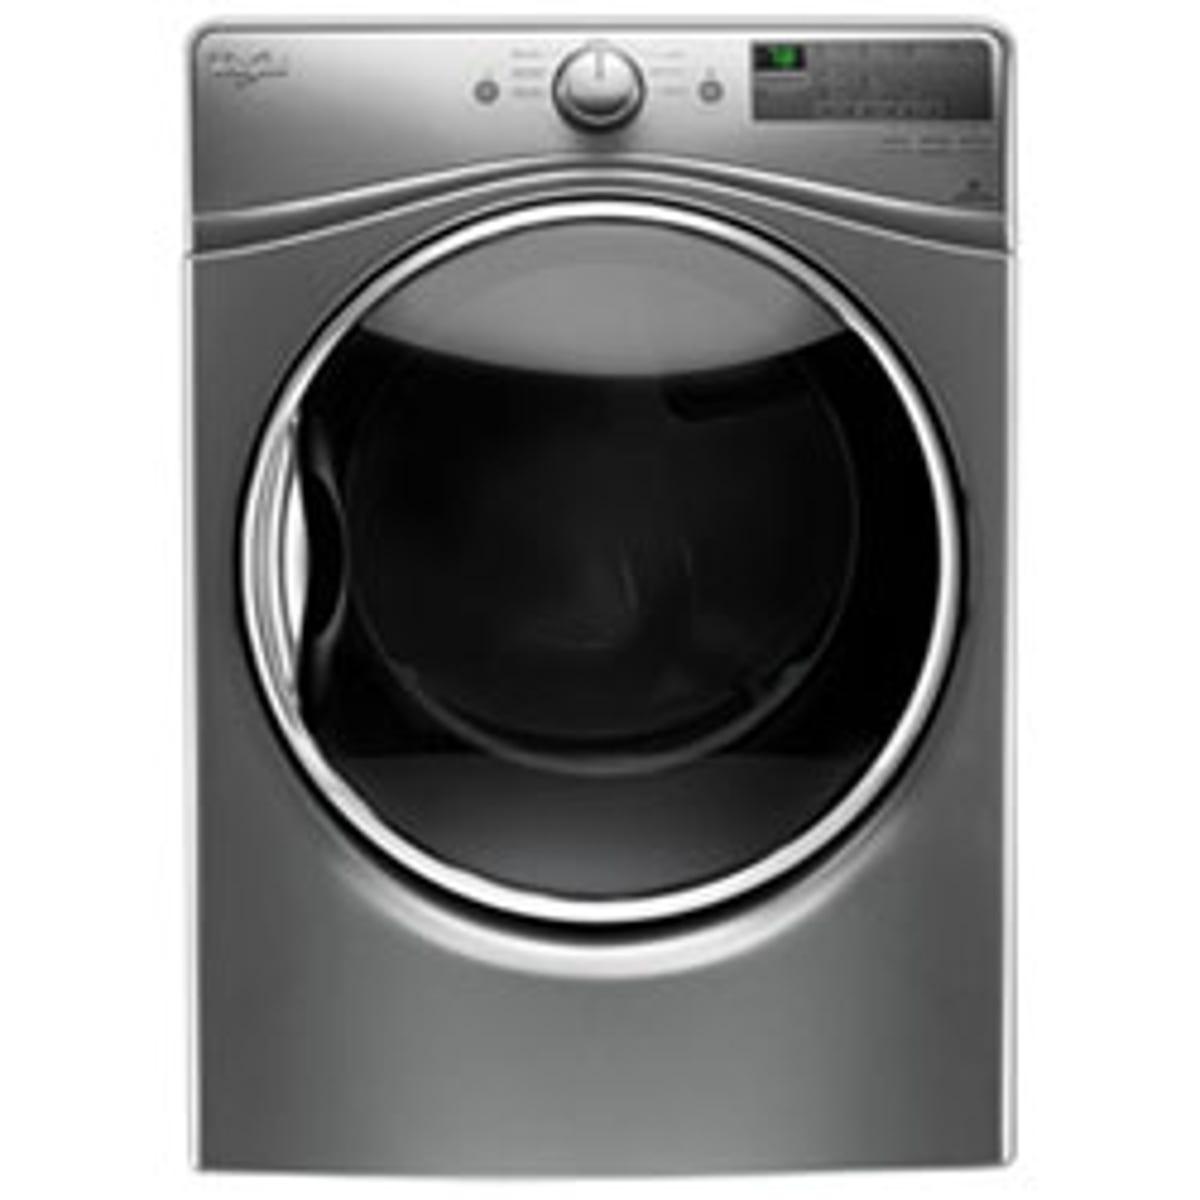 Laundry Machines Appliances Best Buy Canada